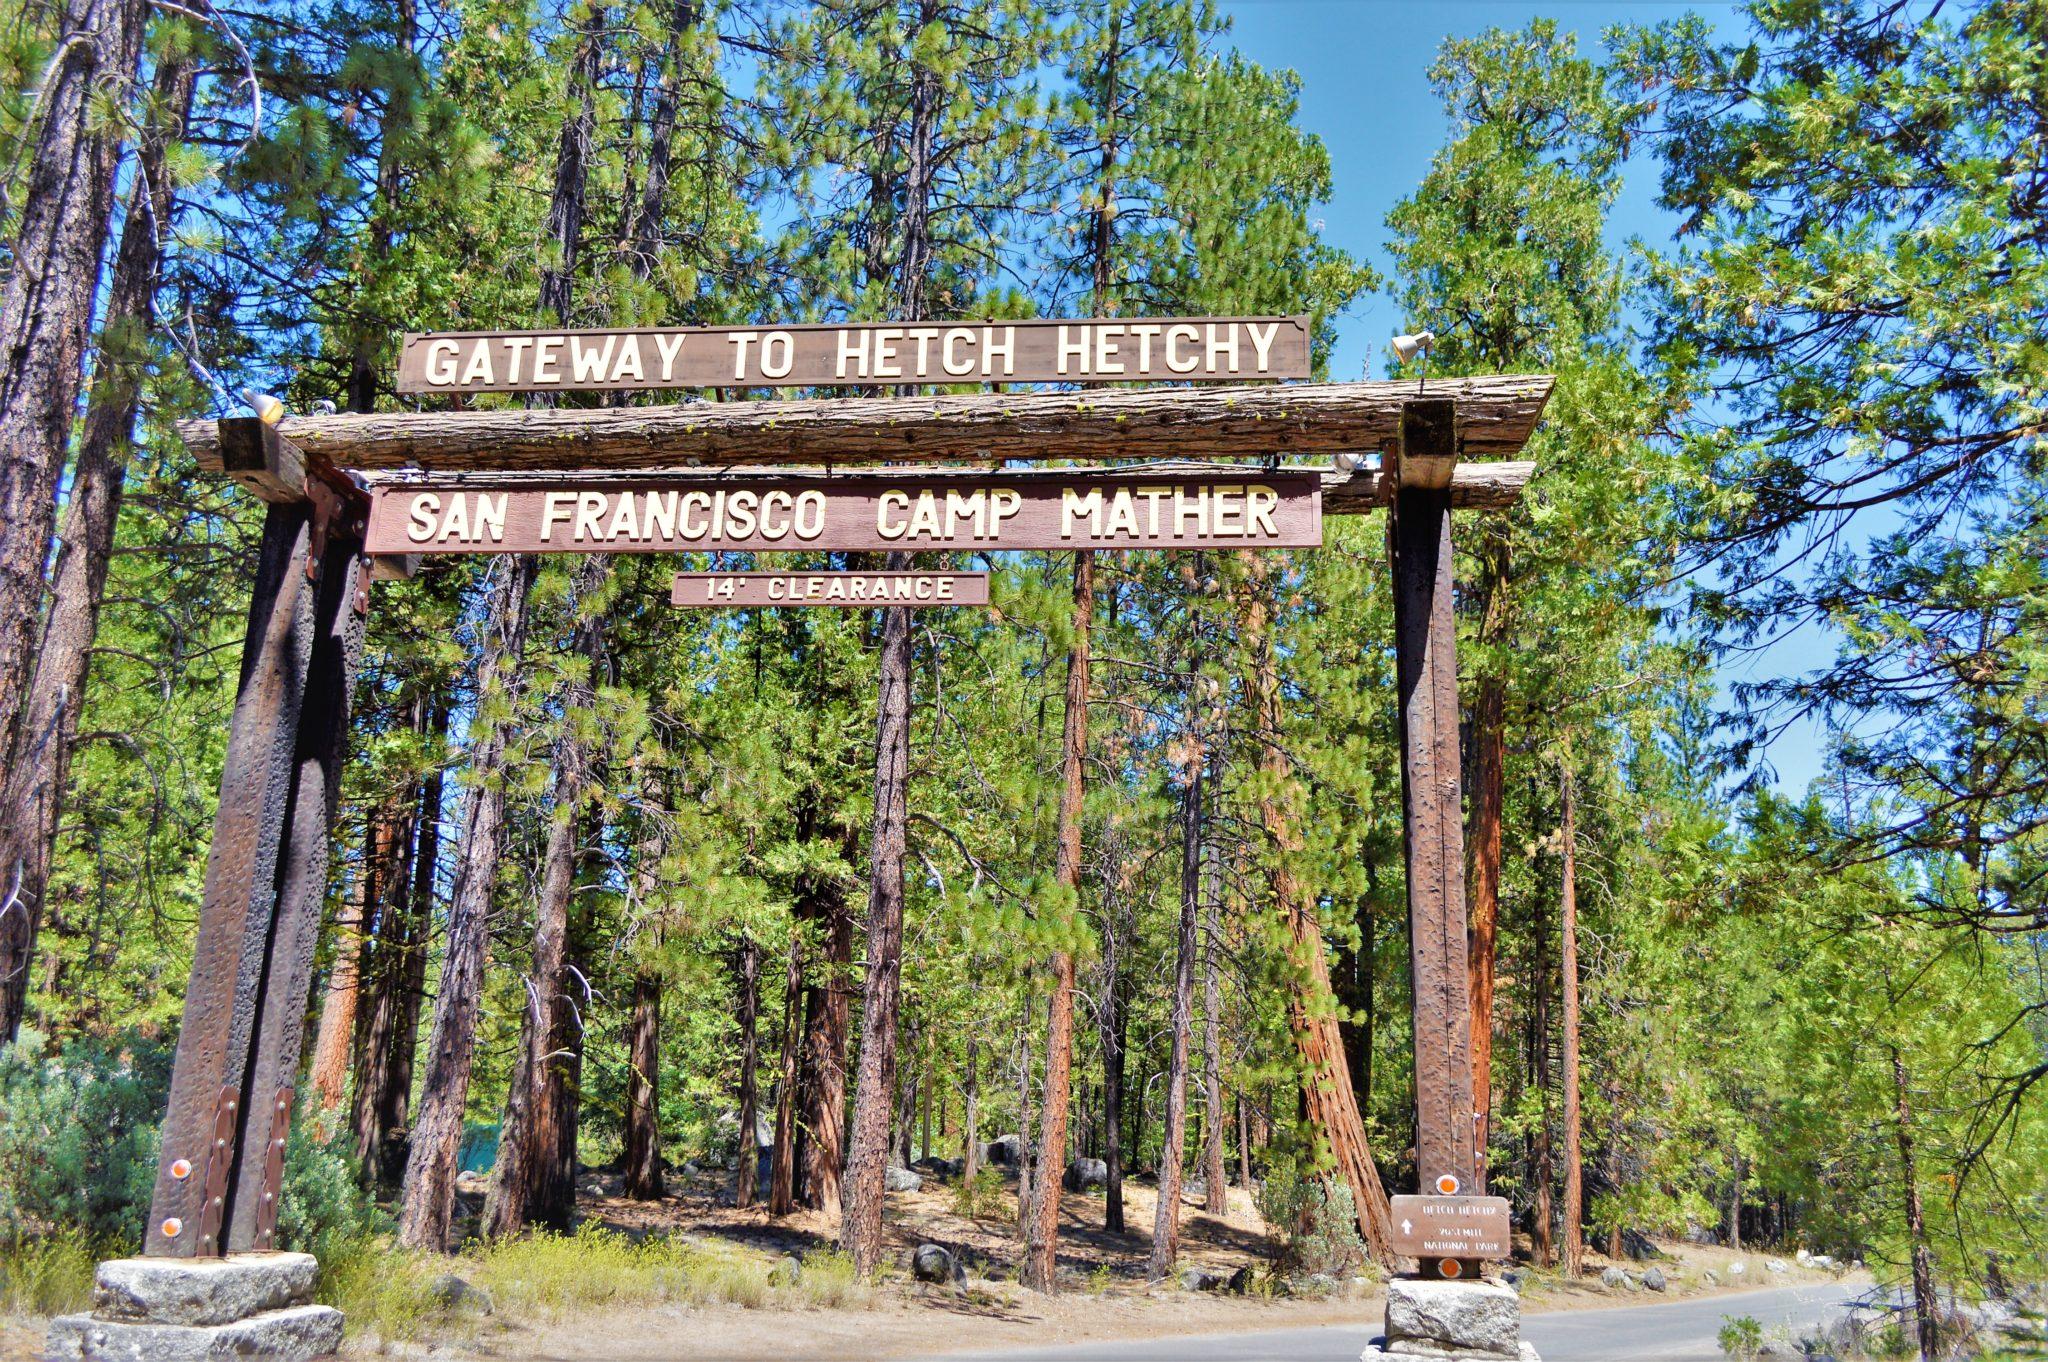 Gateway to Hetch Hetchy park, California